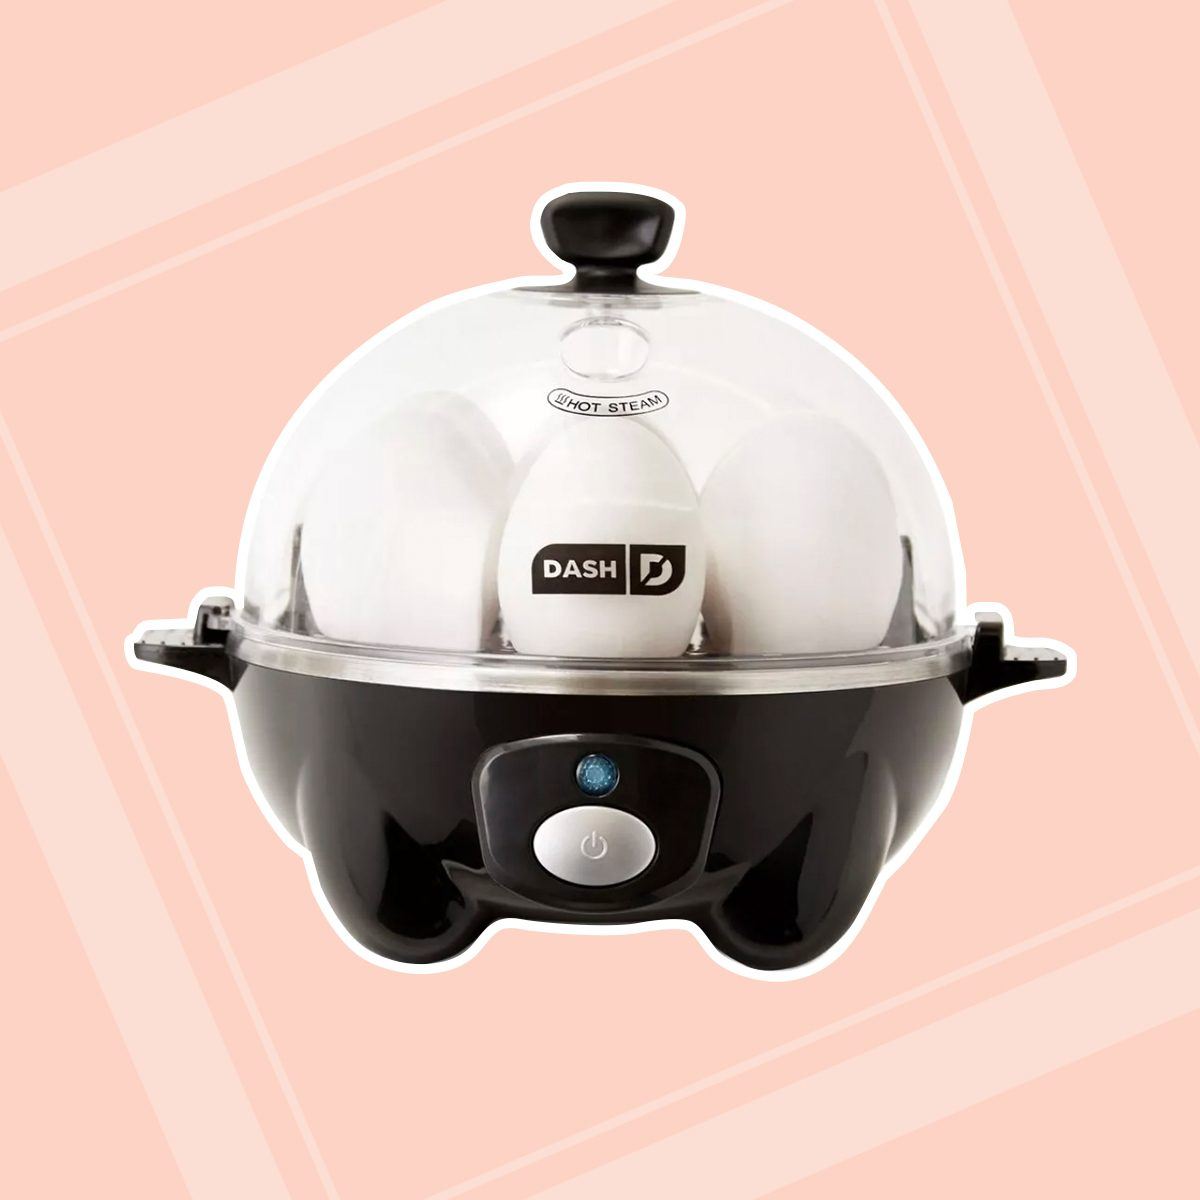 Dash 7-Egg Everyday Egg Cooker